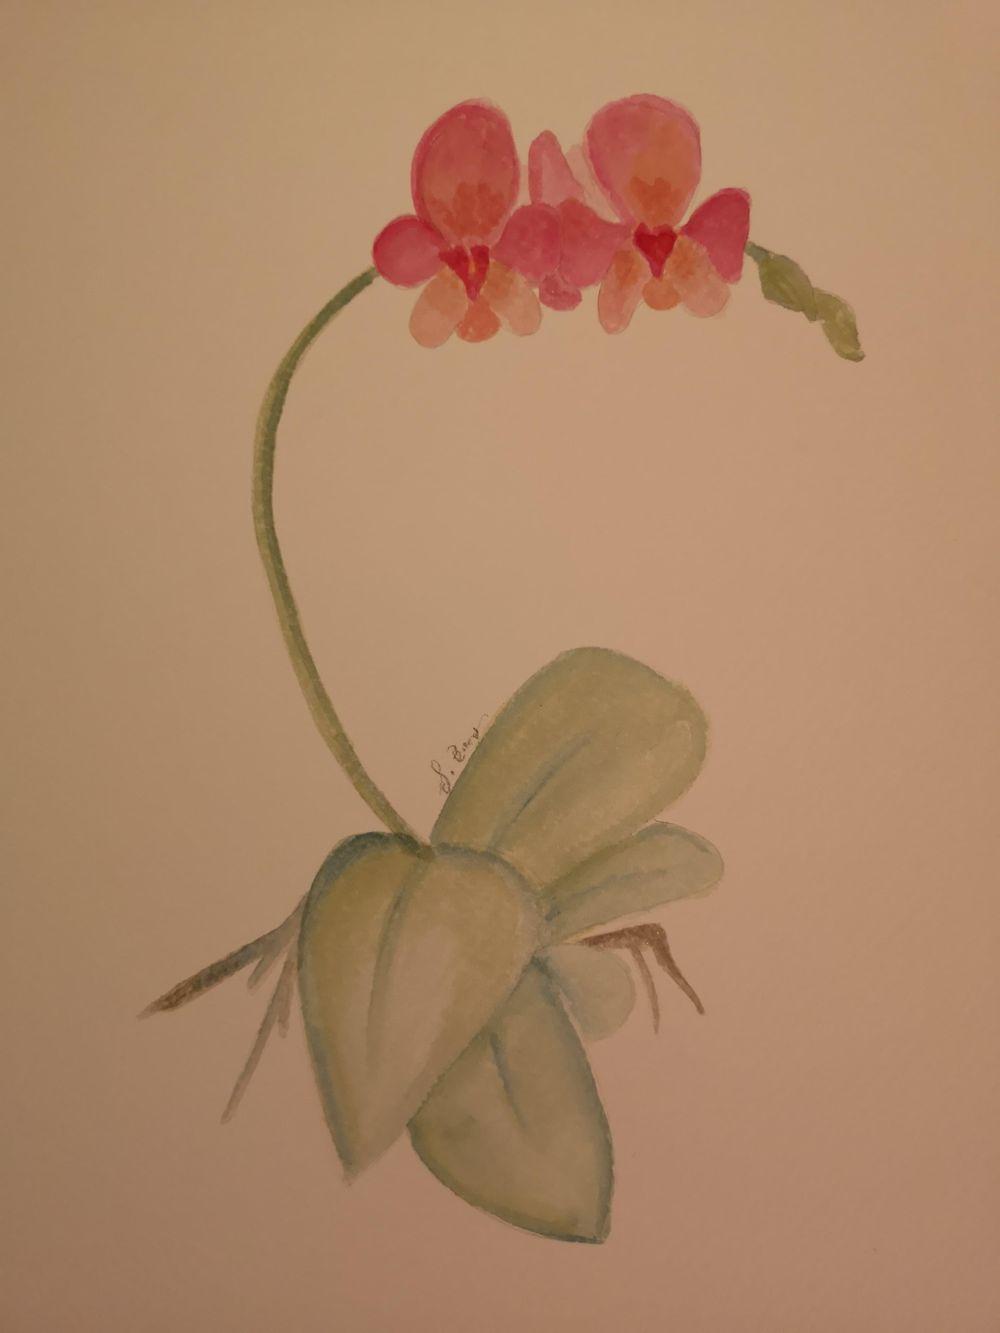 Orhideje - image 1 - student project